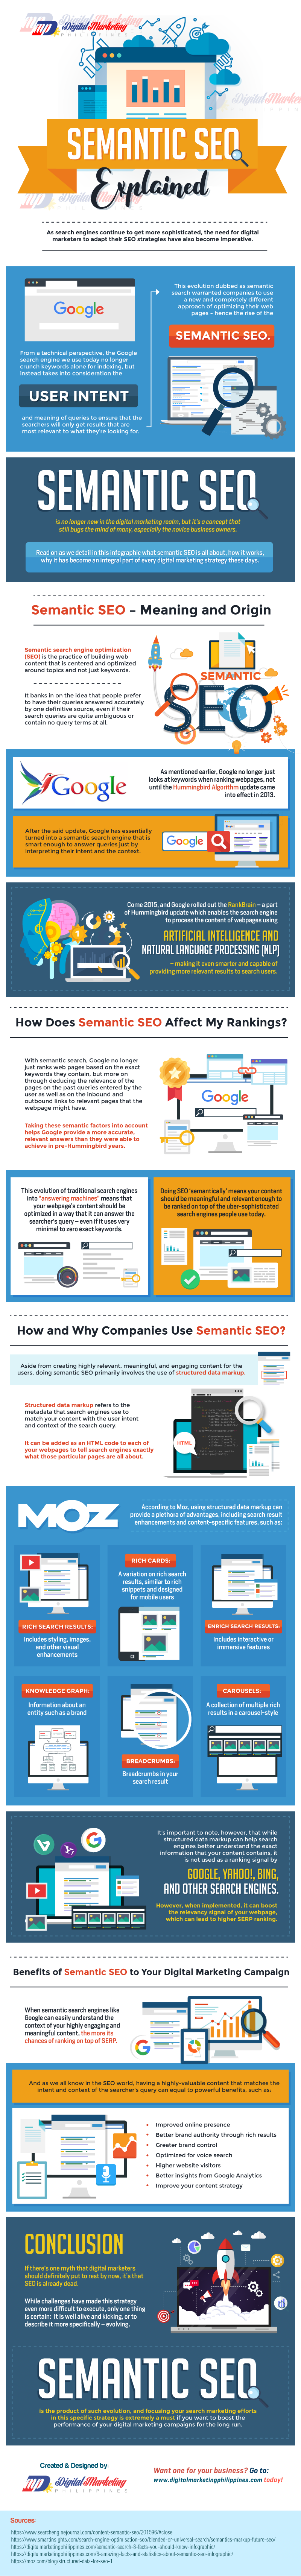 Semantic SEO Explained #infographic